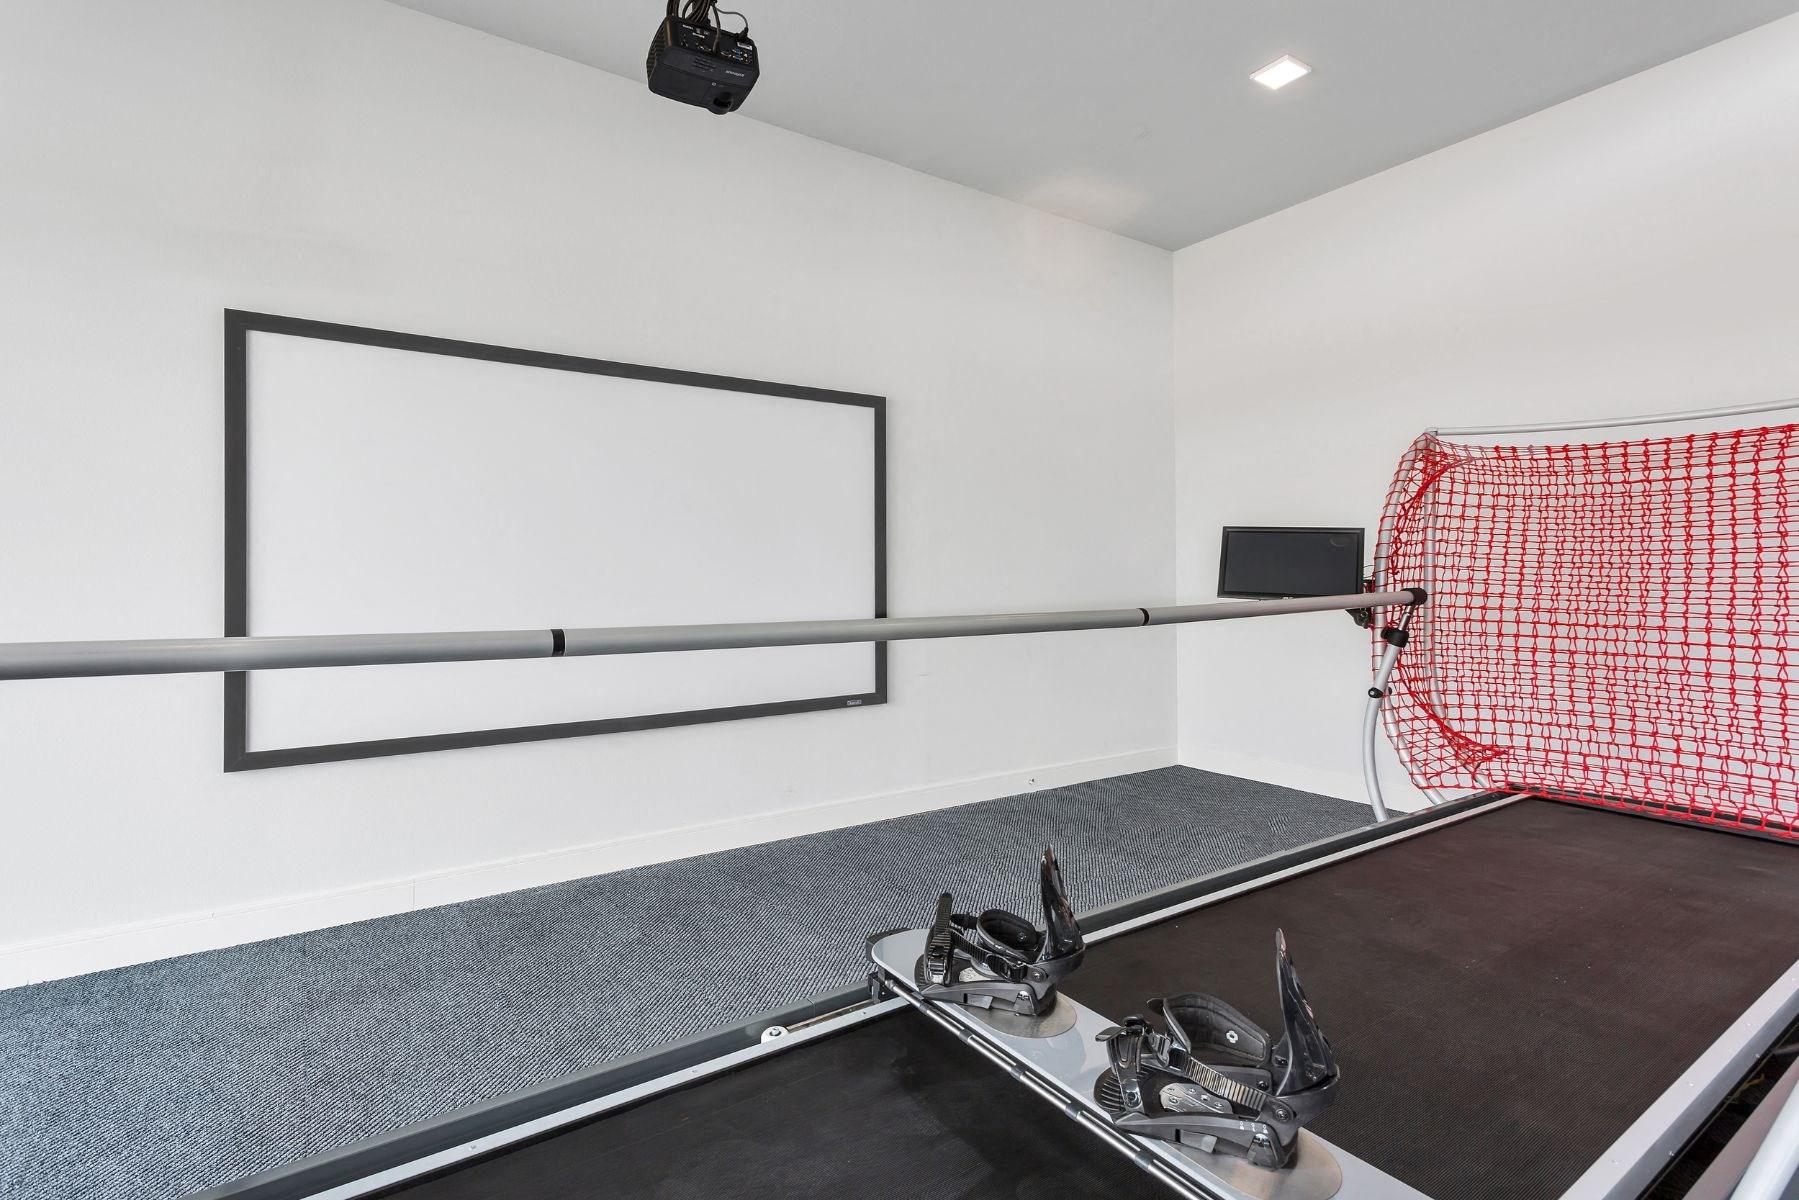 Westwood Green Apartments ski simulator machine